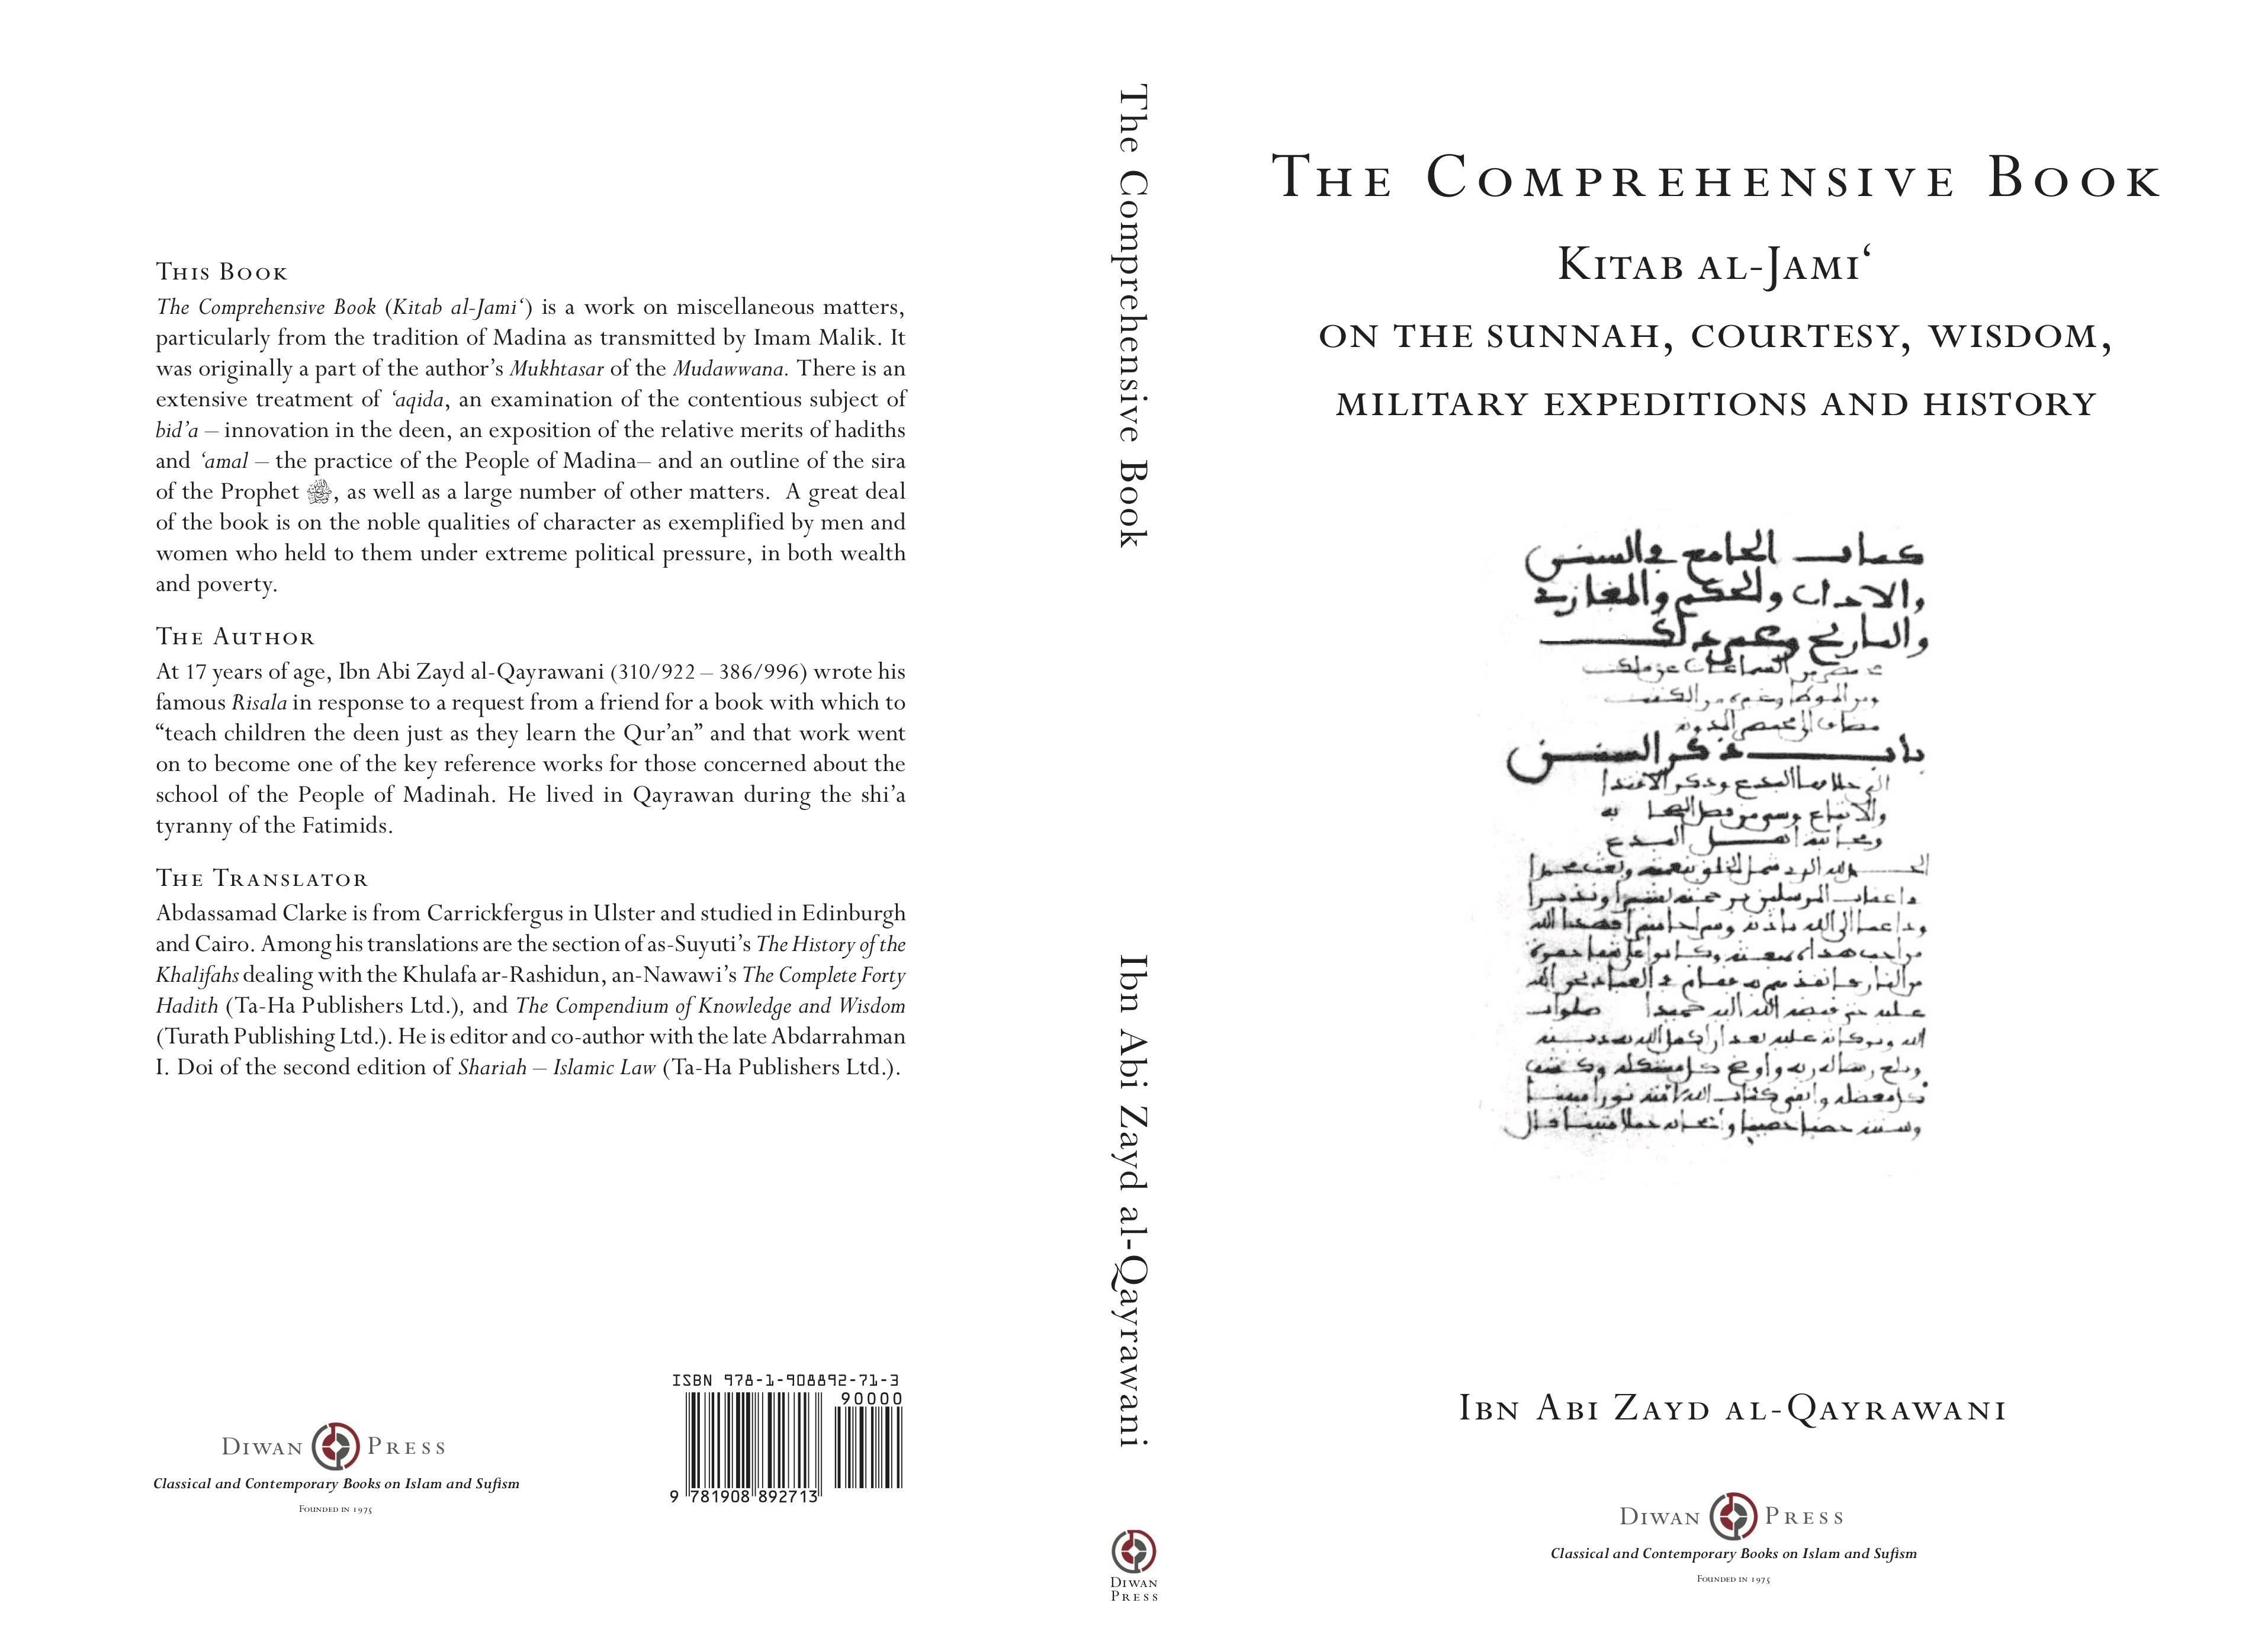 Kitabul Jami Pdf